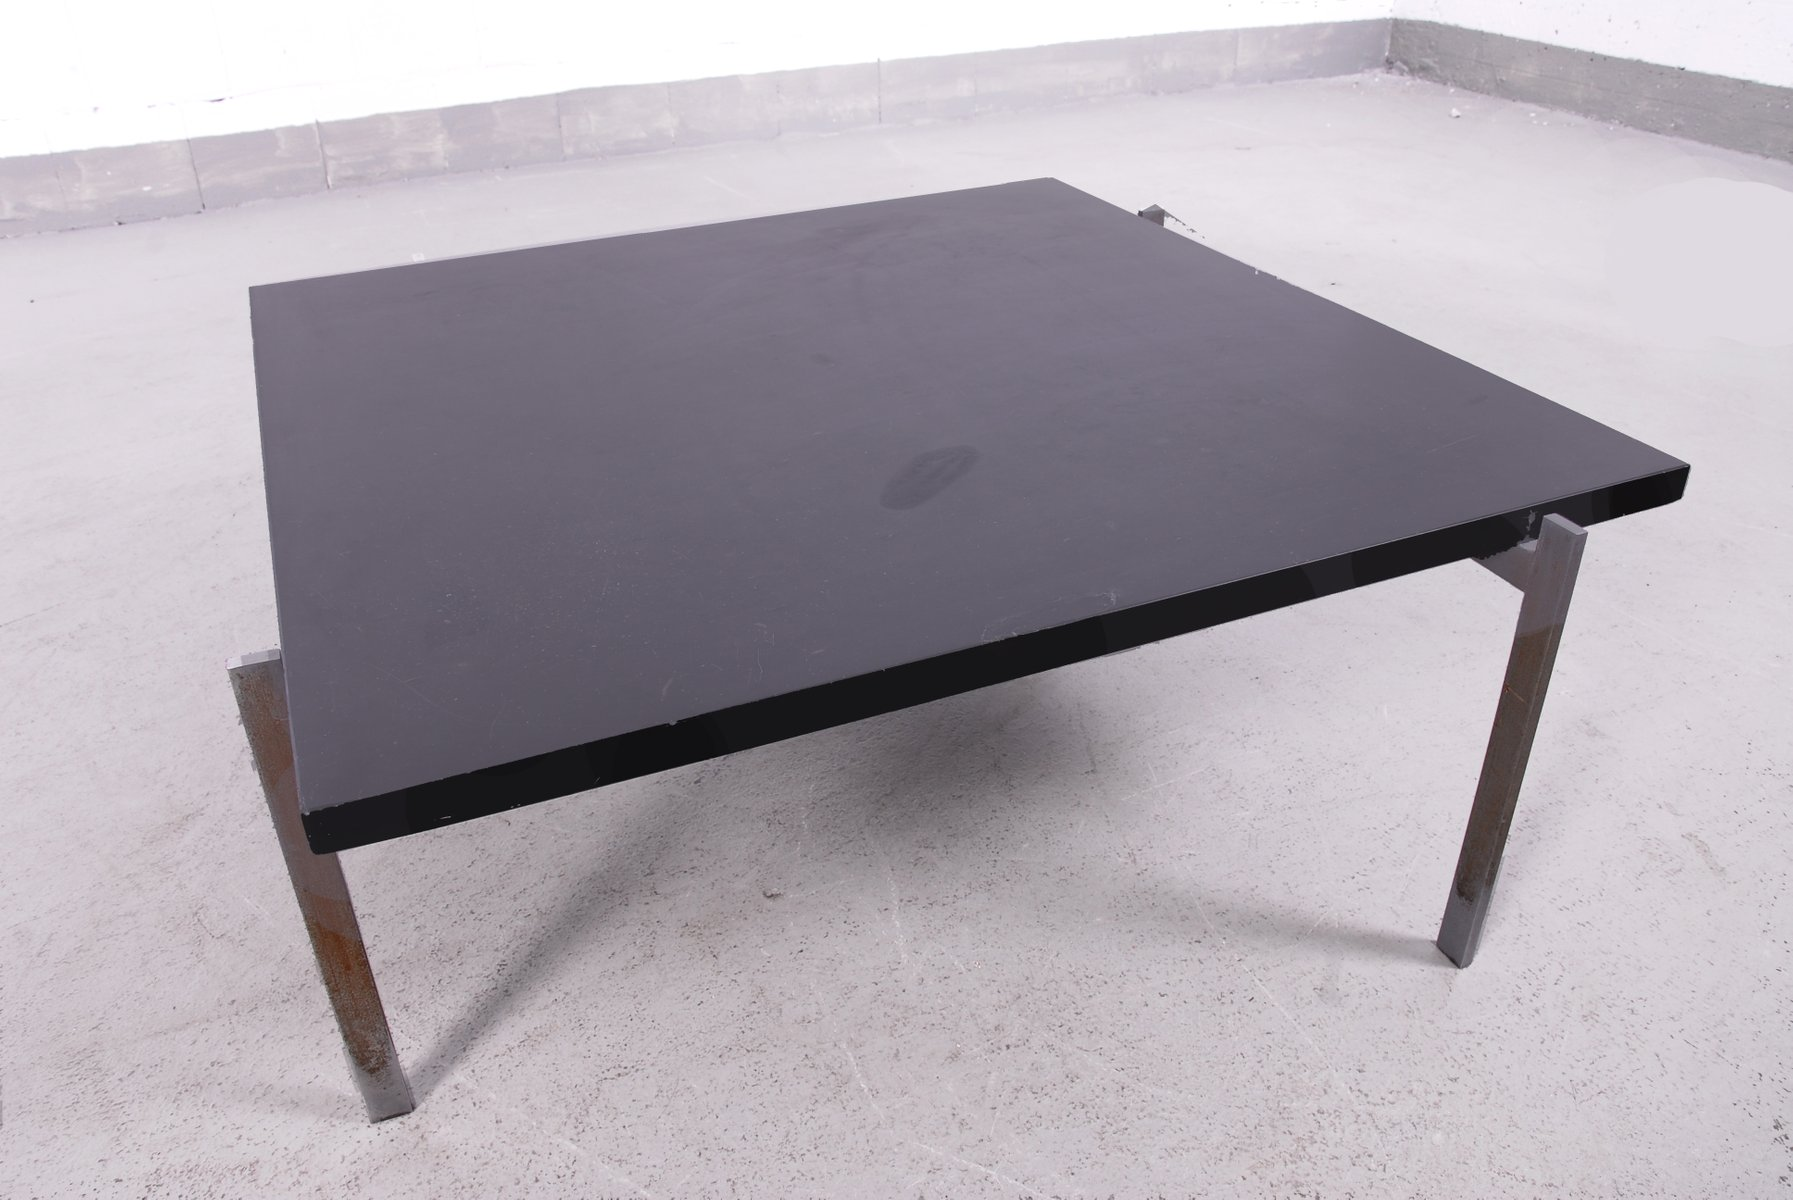 Table basse avec ardoise for Plateau table basse